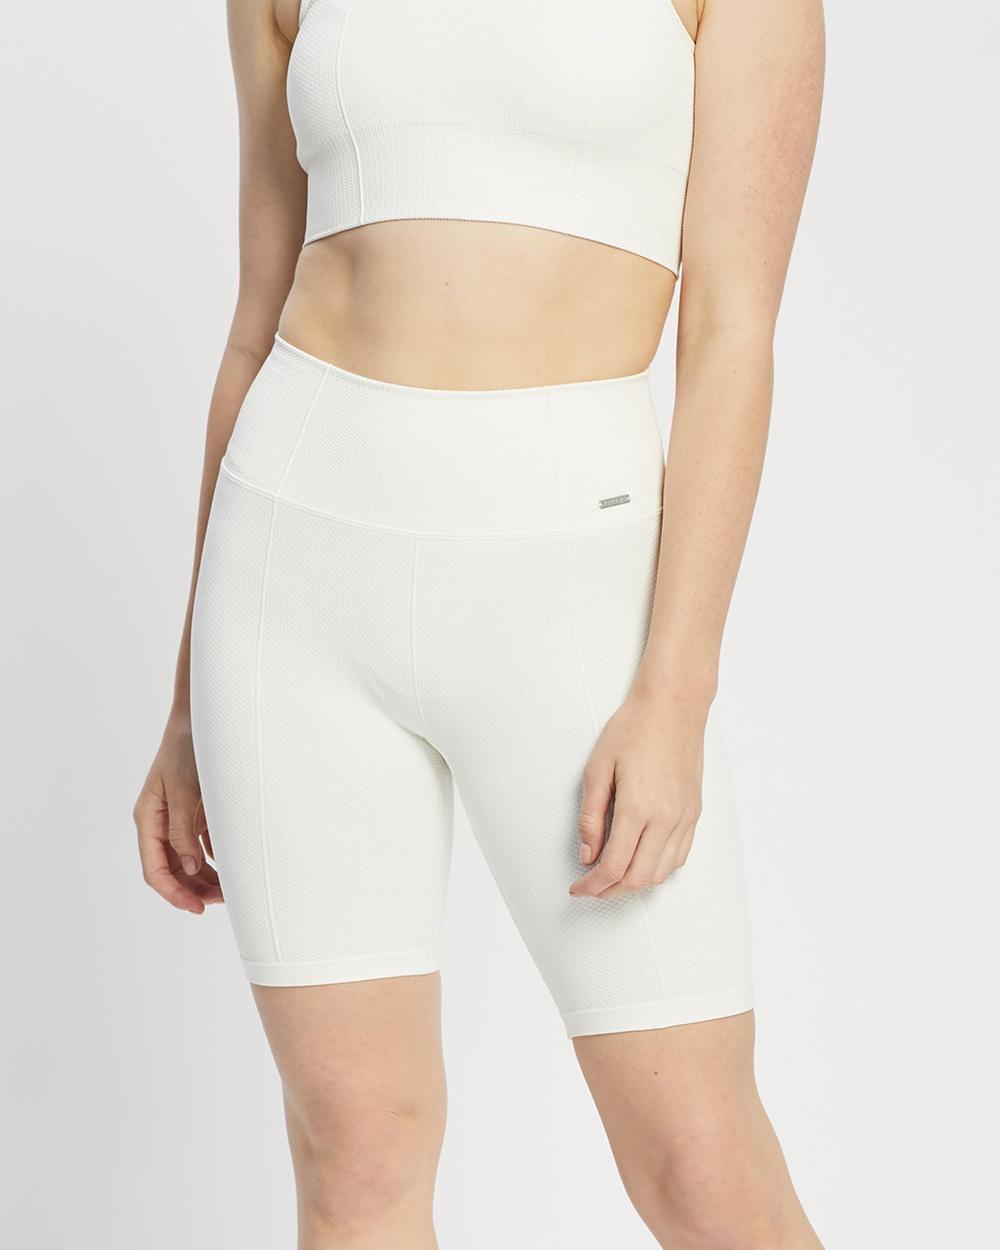 Aim'n Luxe Seamless Biker Shorts 1/2 Tights Off-White